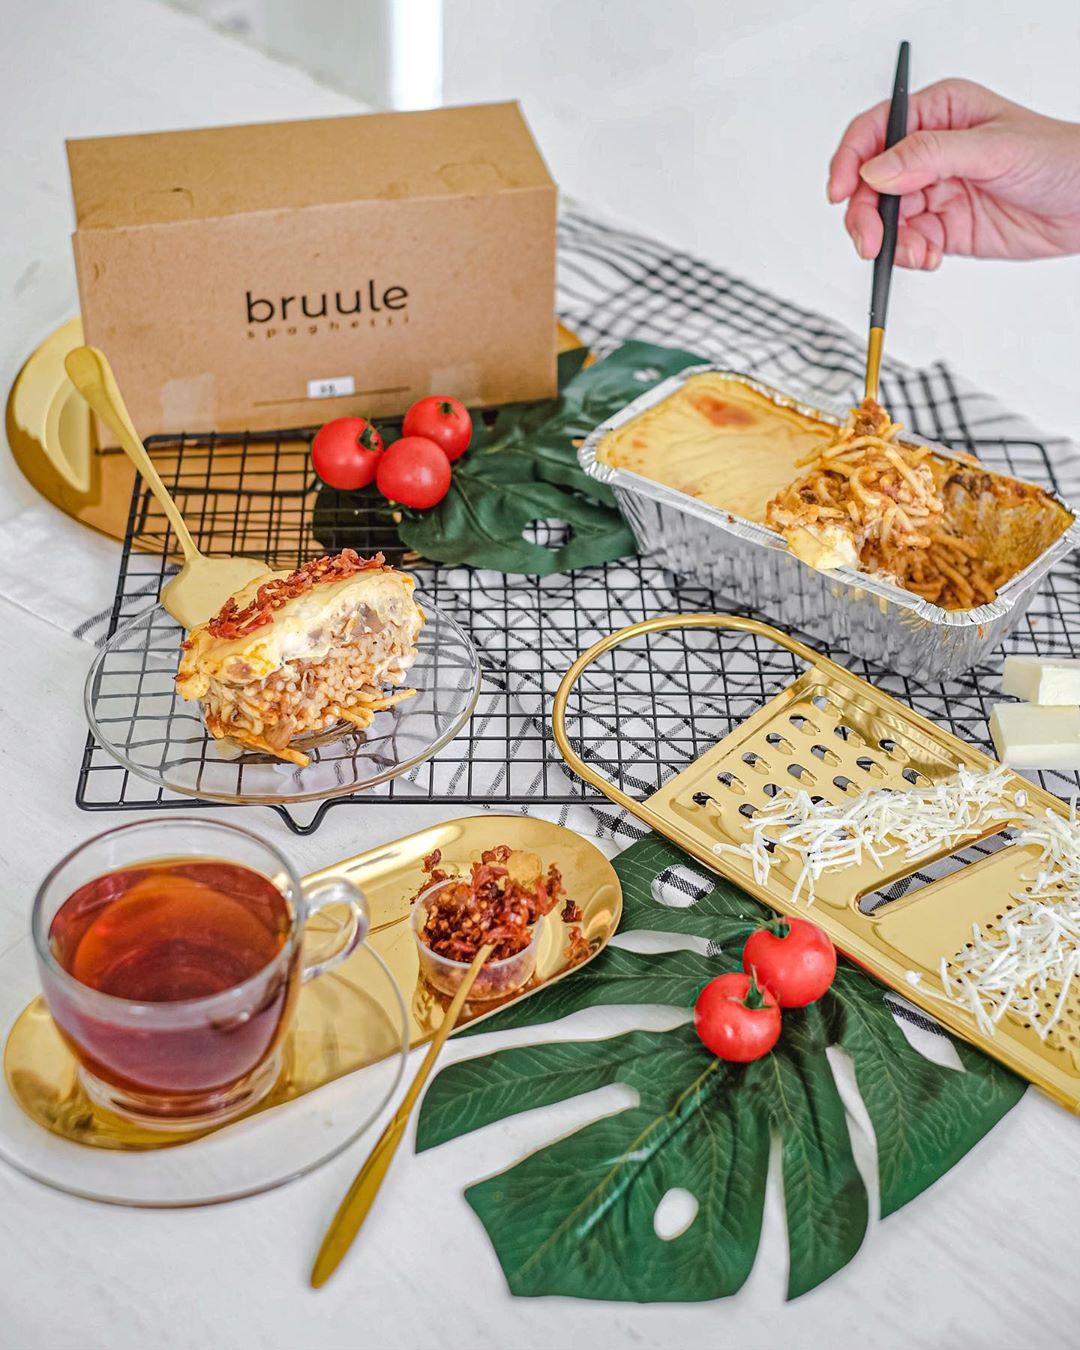 4 Delivery Spaghetti Brulee di Jakarta yang Lezatnya Tiada Dua